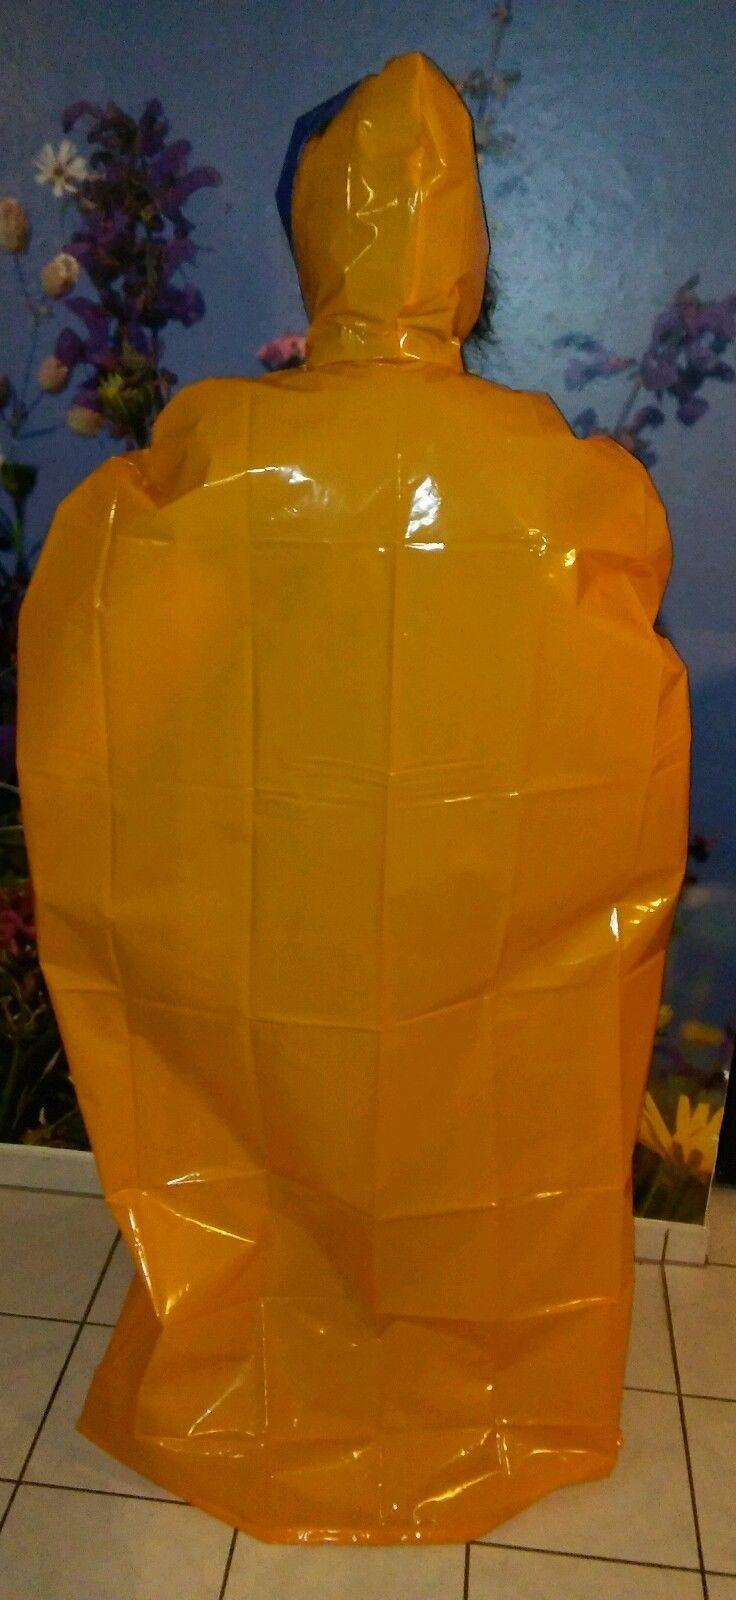 pvc regencape lack vinyl glanz gummi regenmantel poncho gelb blau rei verschluss in kleidung. Black Bedroom Furniture Sets. Home Design Ideas